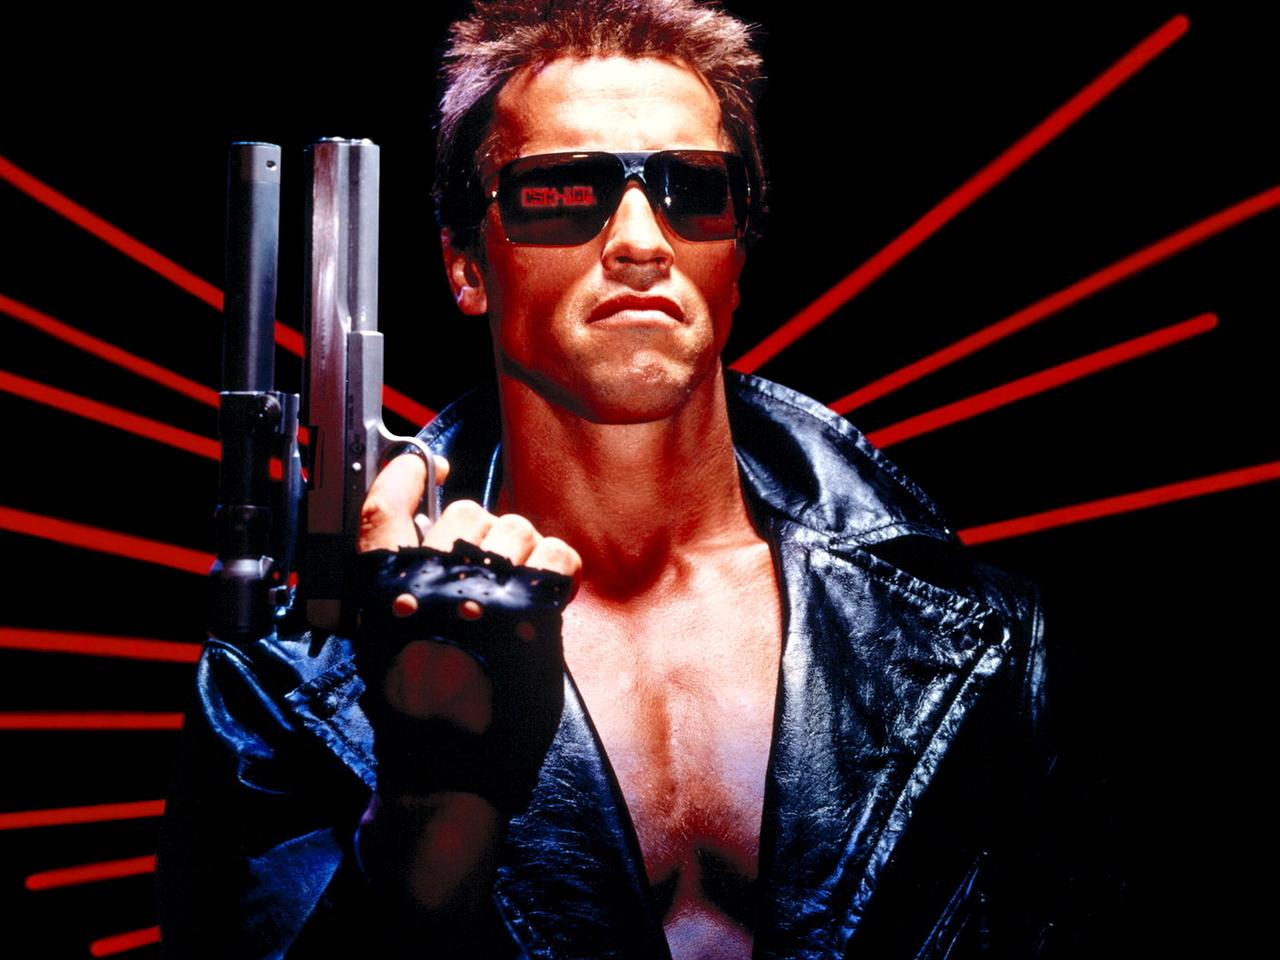 15738 download wallpaper Cinema, People, Actors, Men, Arnold Schwarzenegger, Terminator screensavers and pictures for free